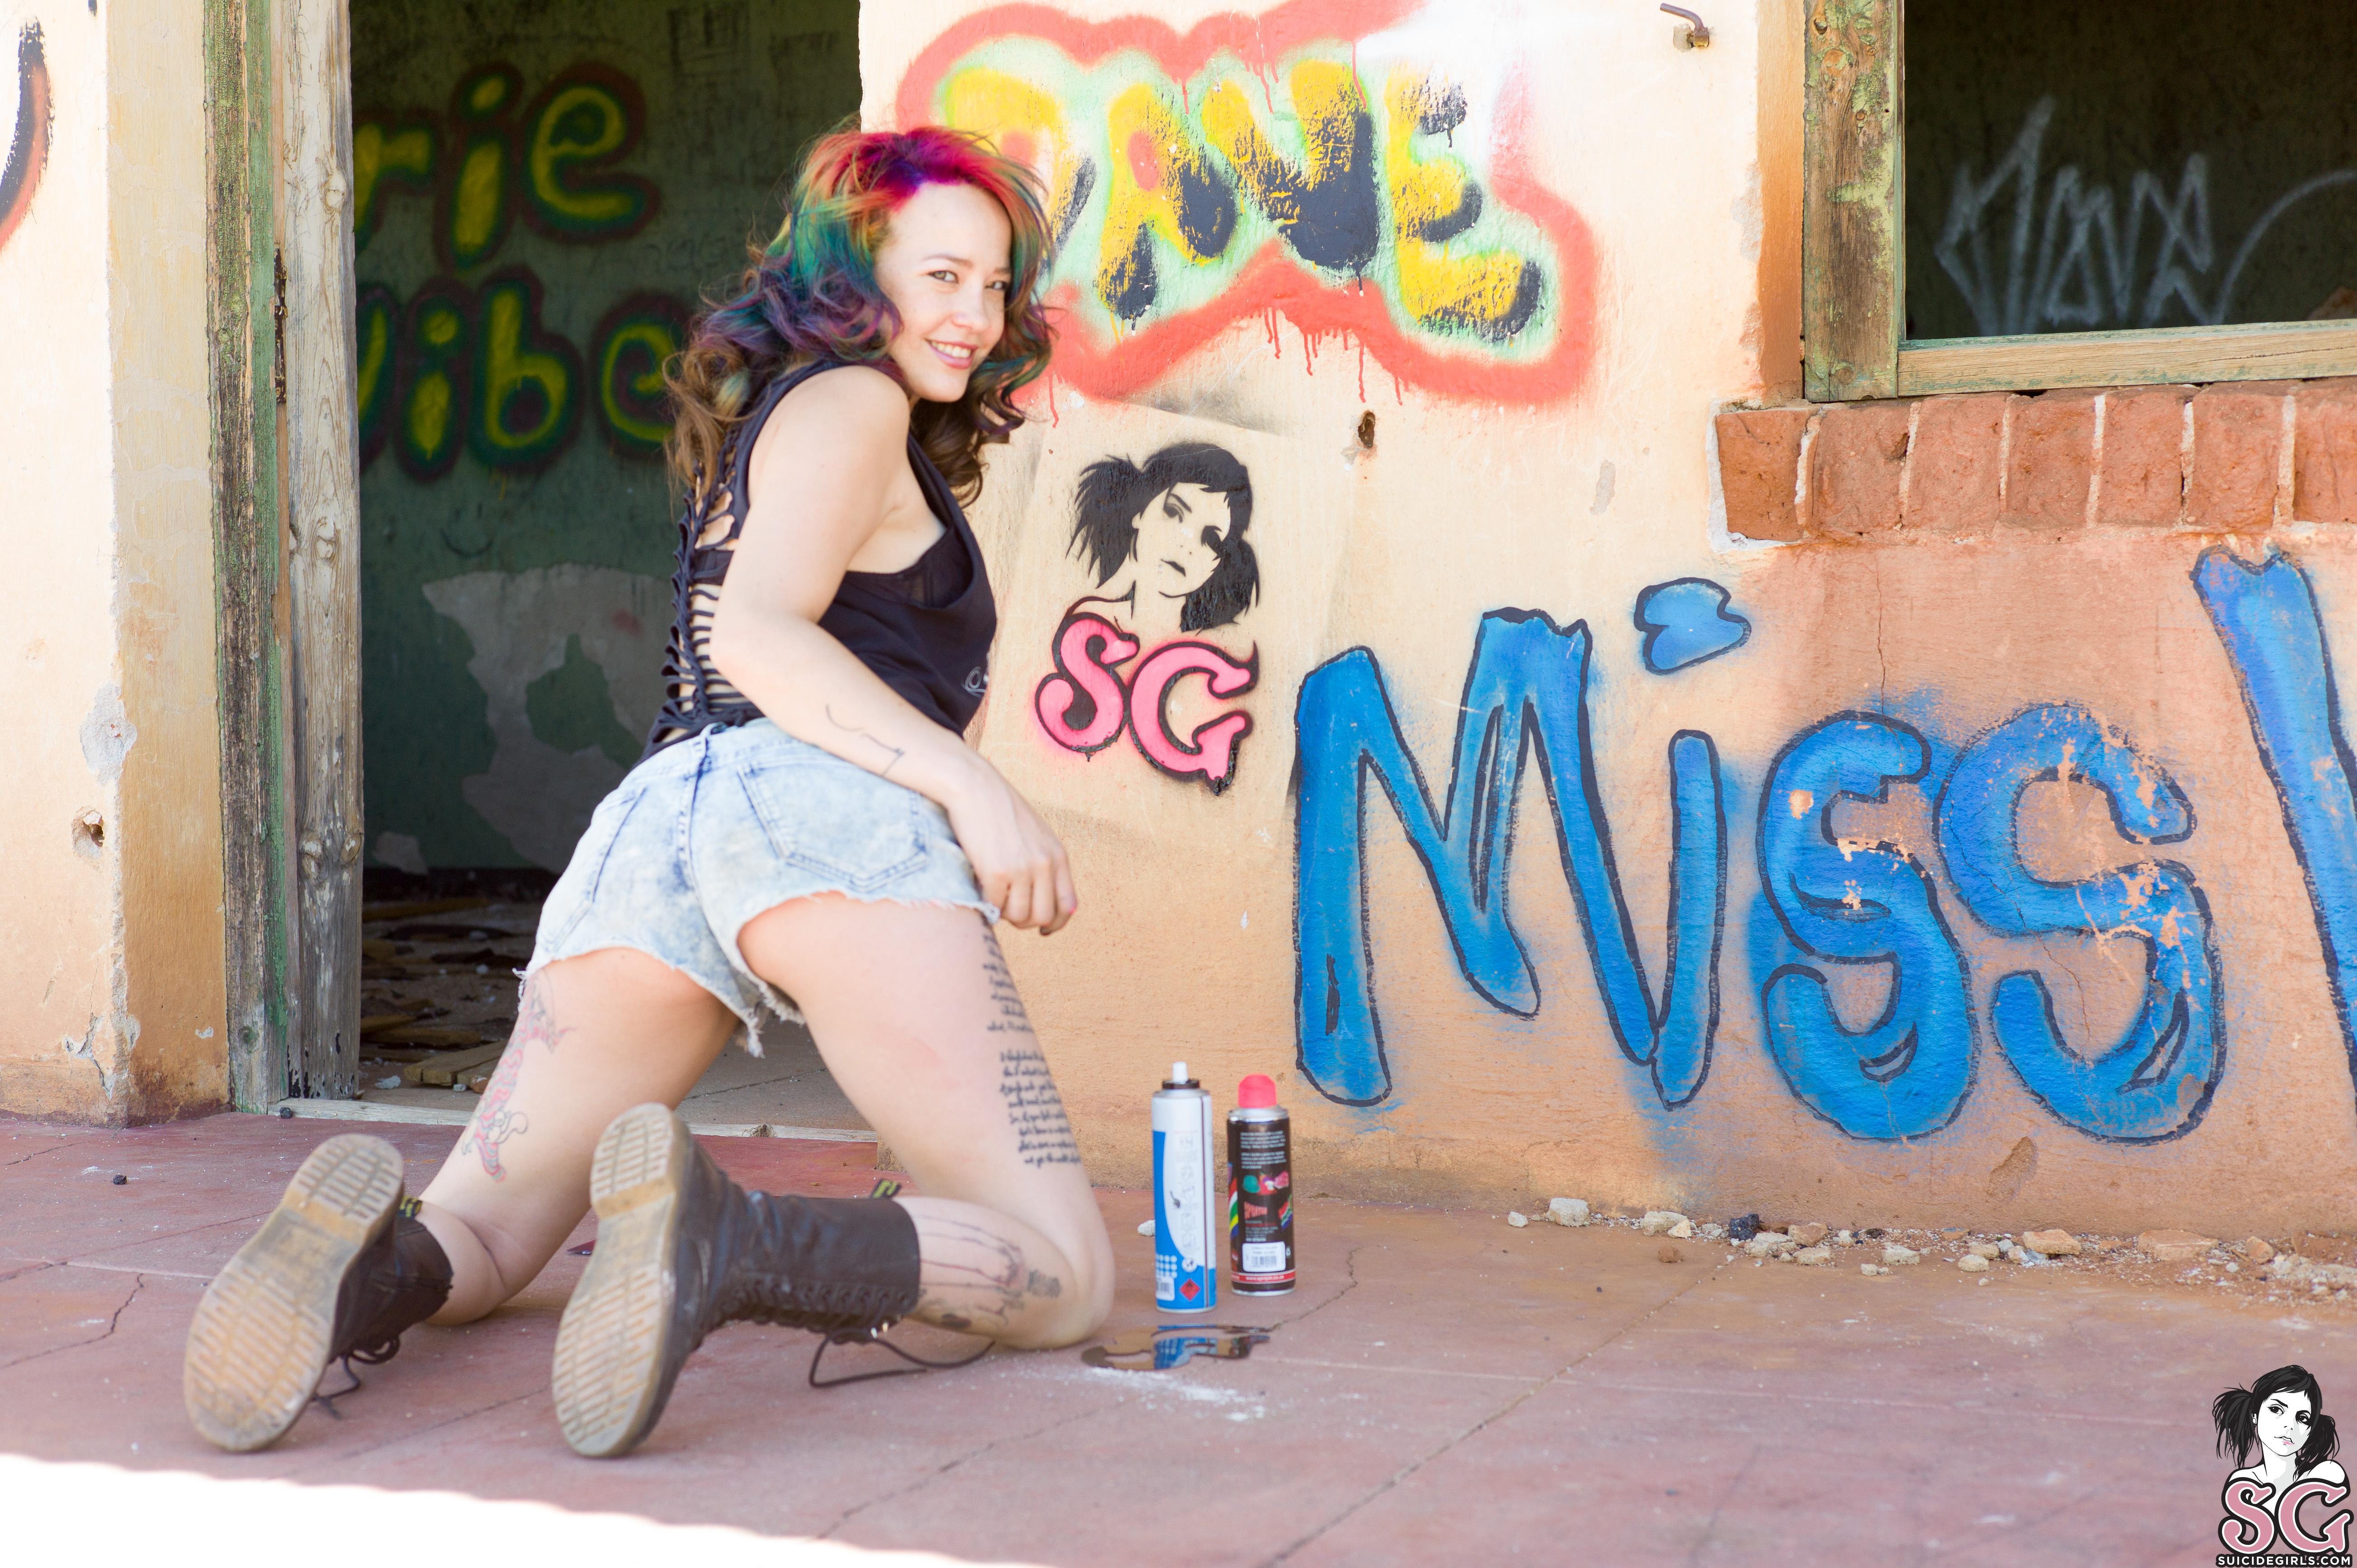 People 5212x3468 Suicide Girls Rainbow hair tattoo women hangar graffiti Missvness Suicide